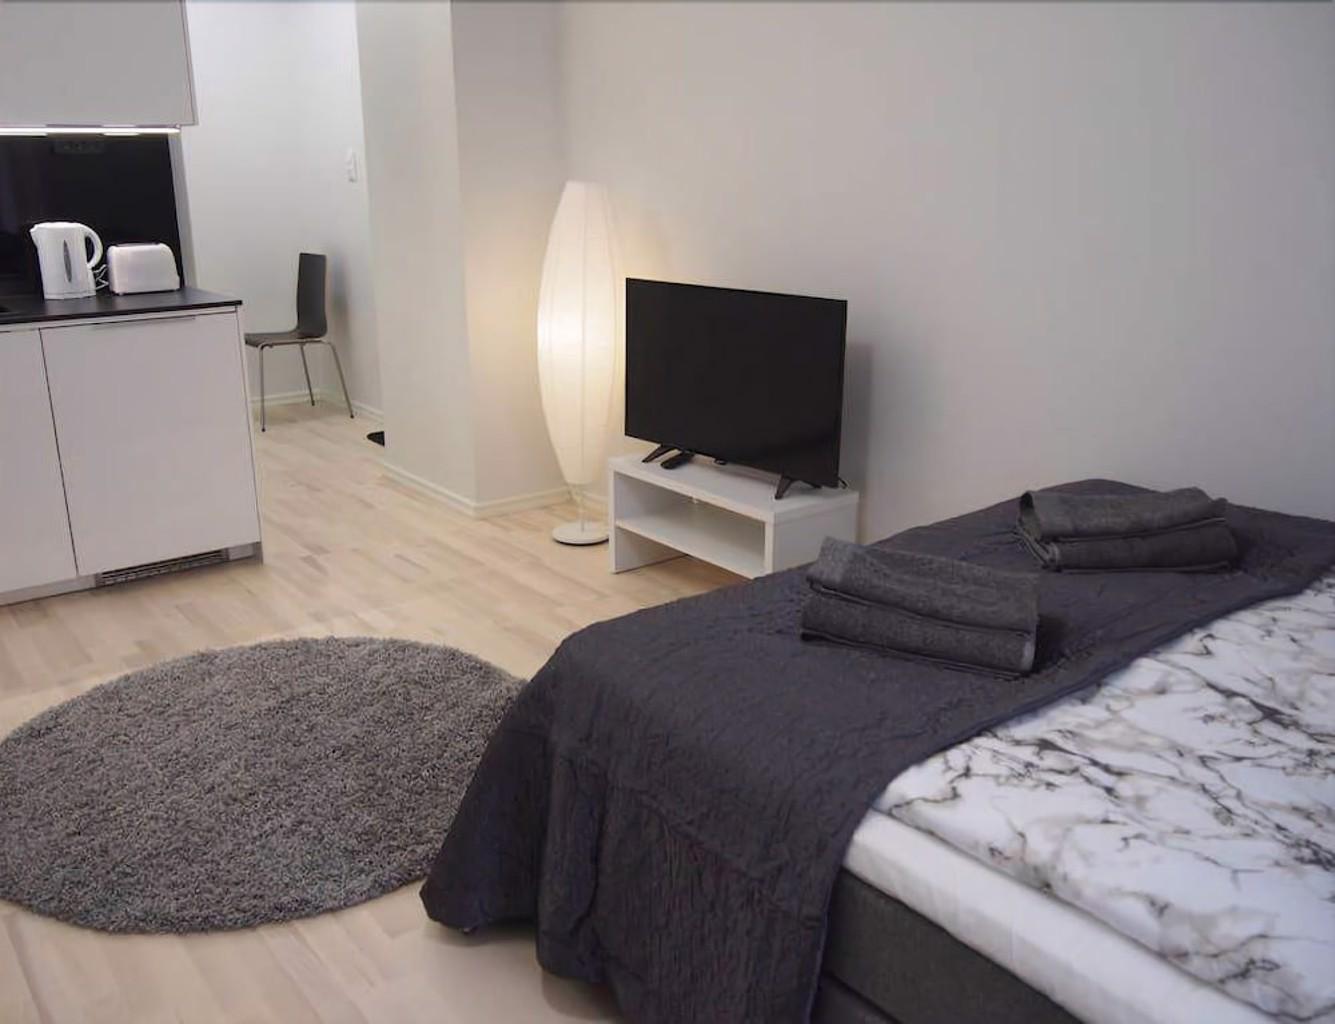 2ndhomes Pietarinkatu Apartments 1